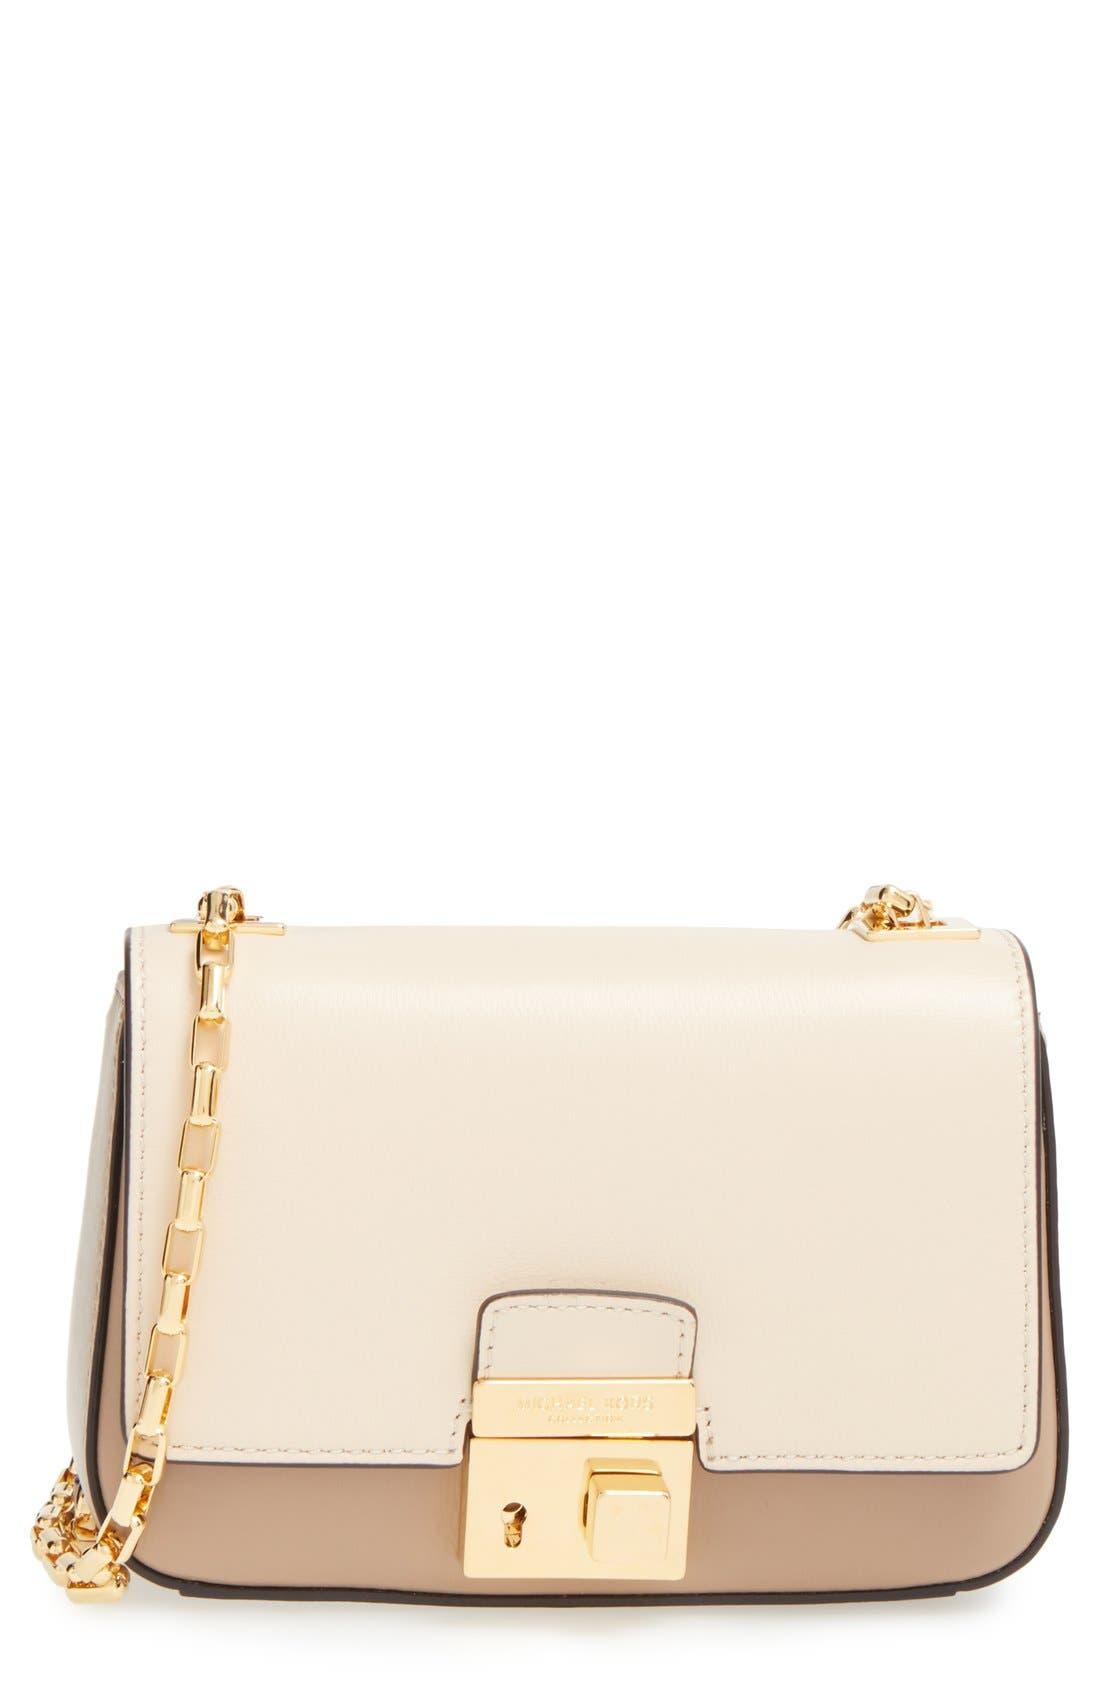 Main Image - Michael Kors 'Small Gia' Chain Strap Leather Shoulder Bag